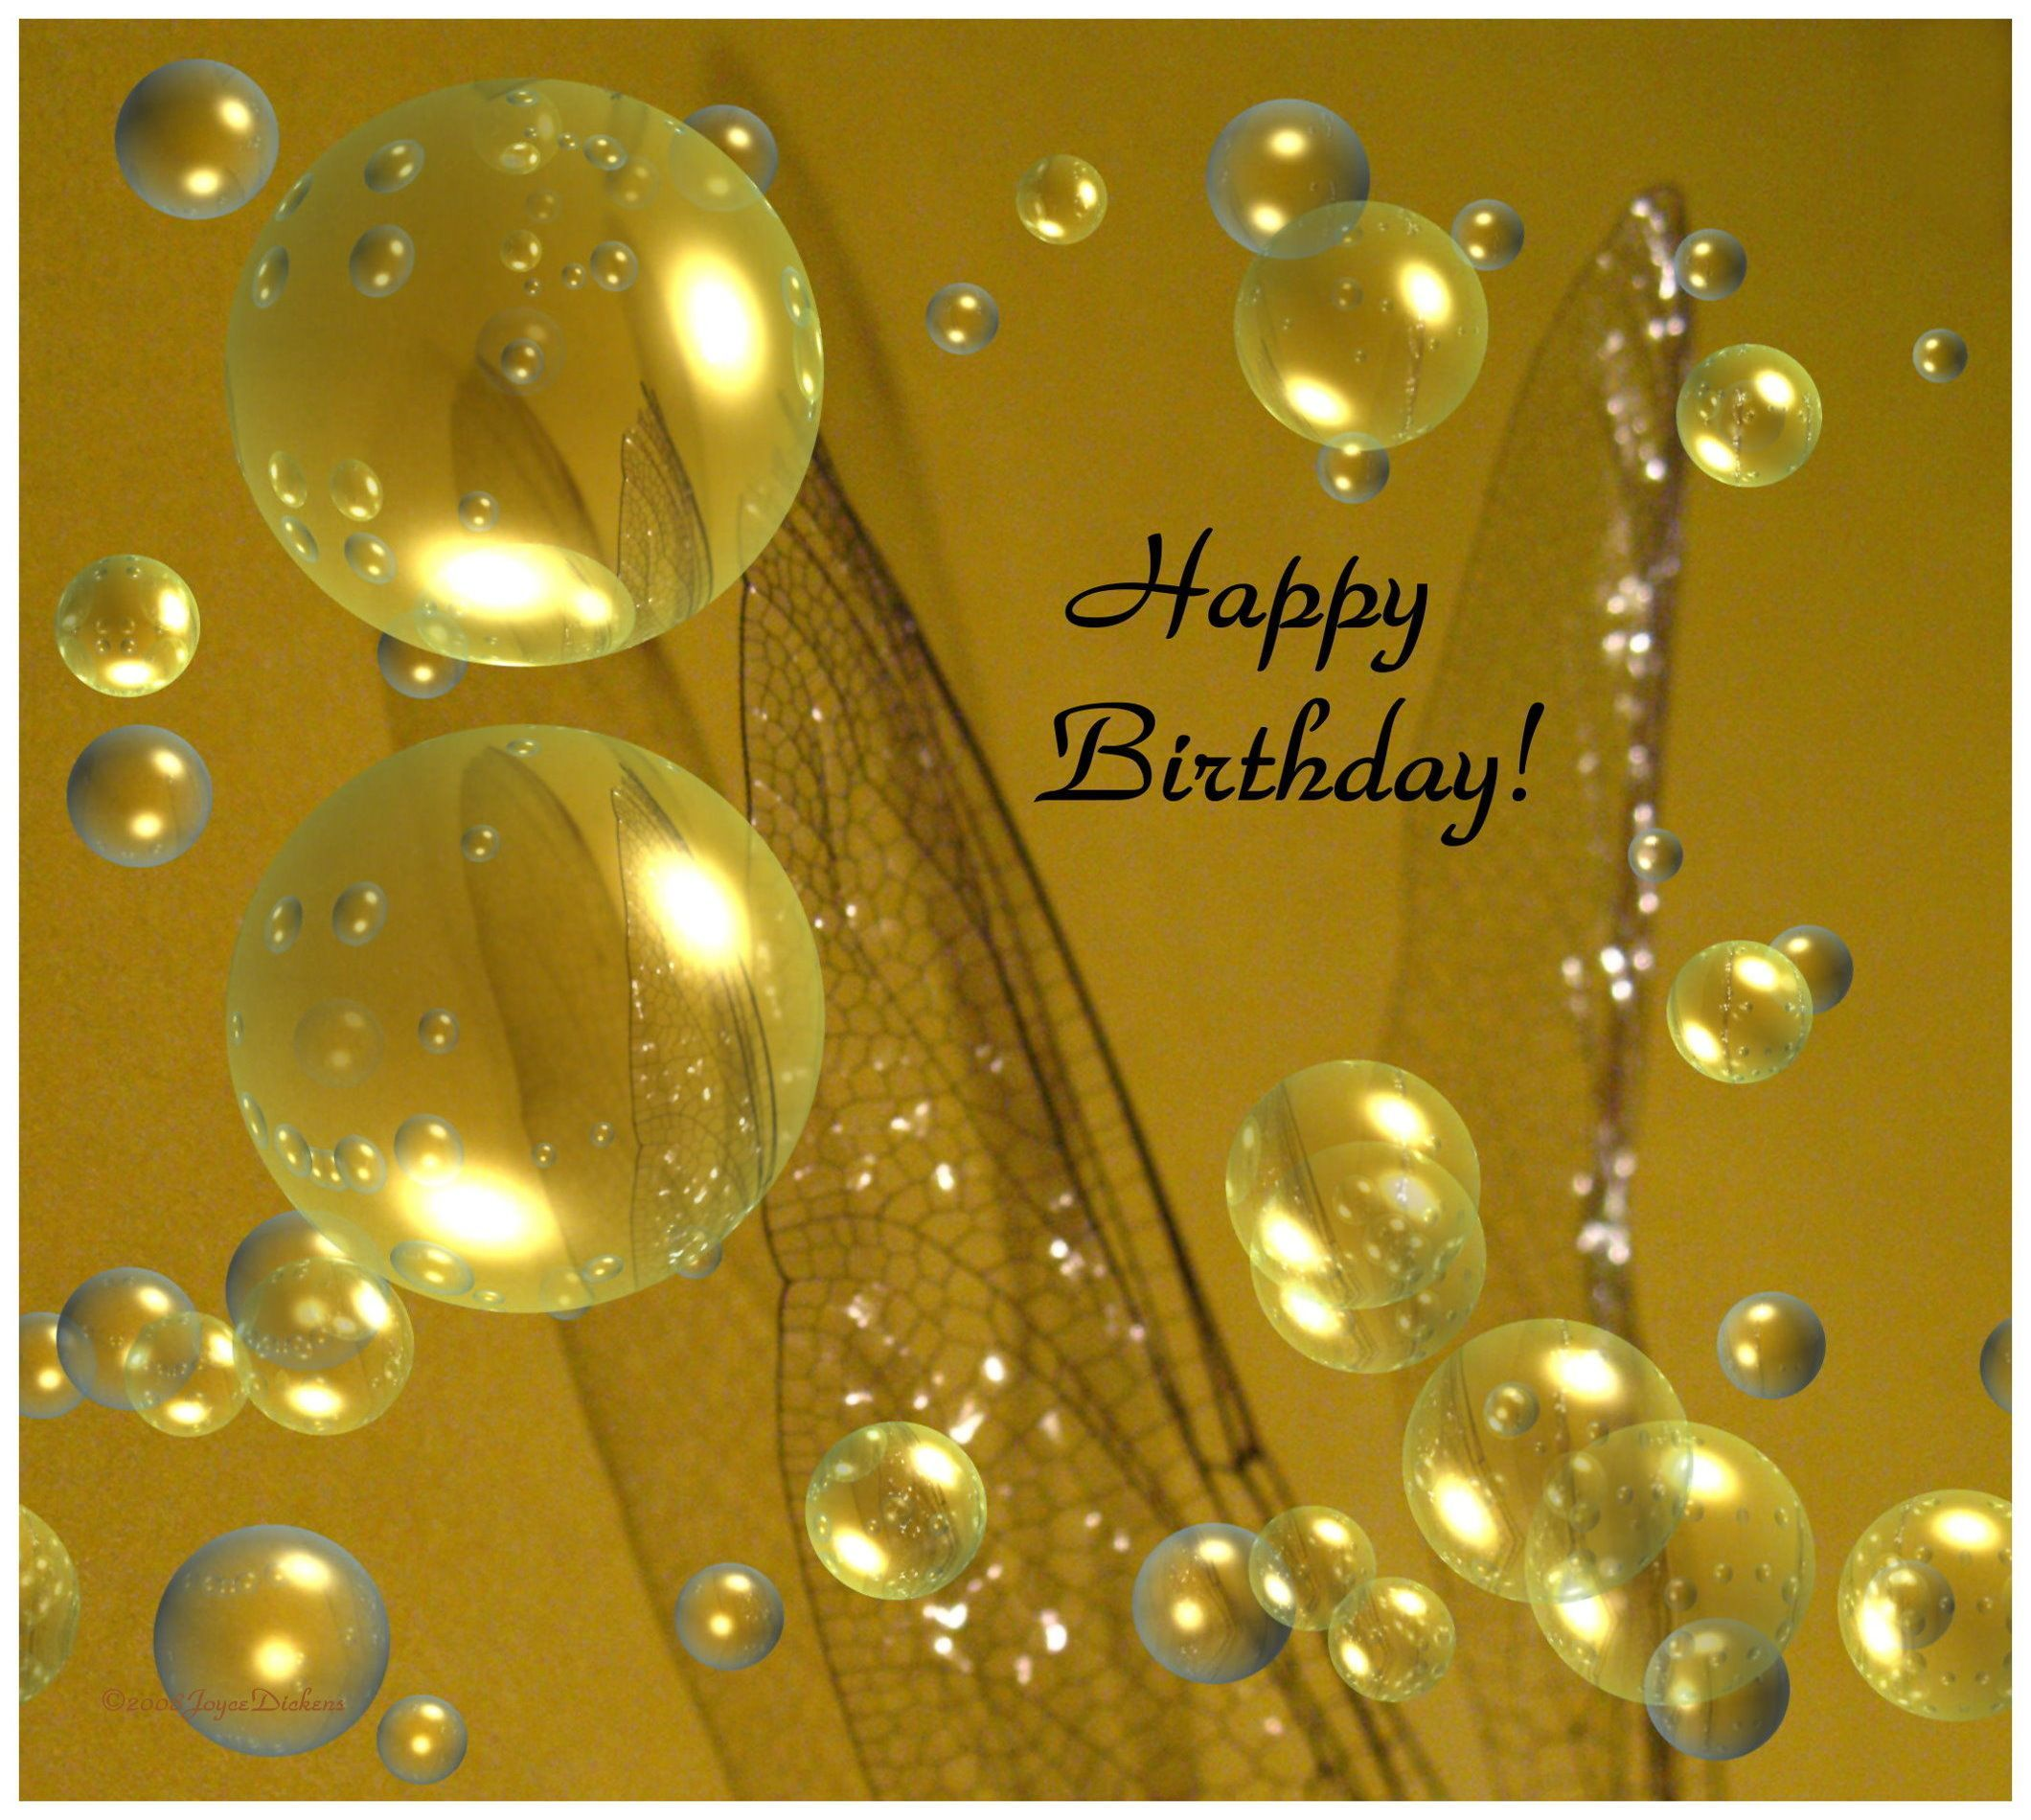 happy birthday nature images google search happy birthday